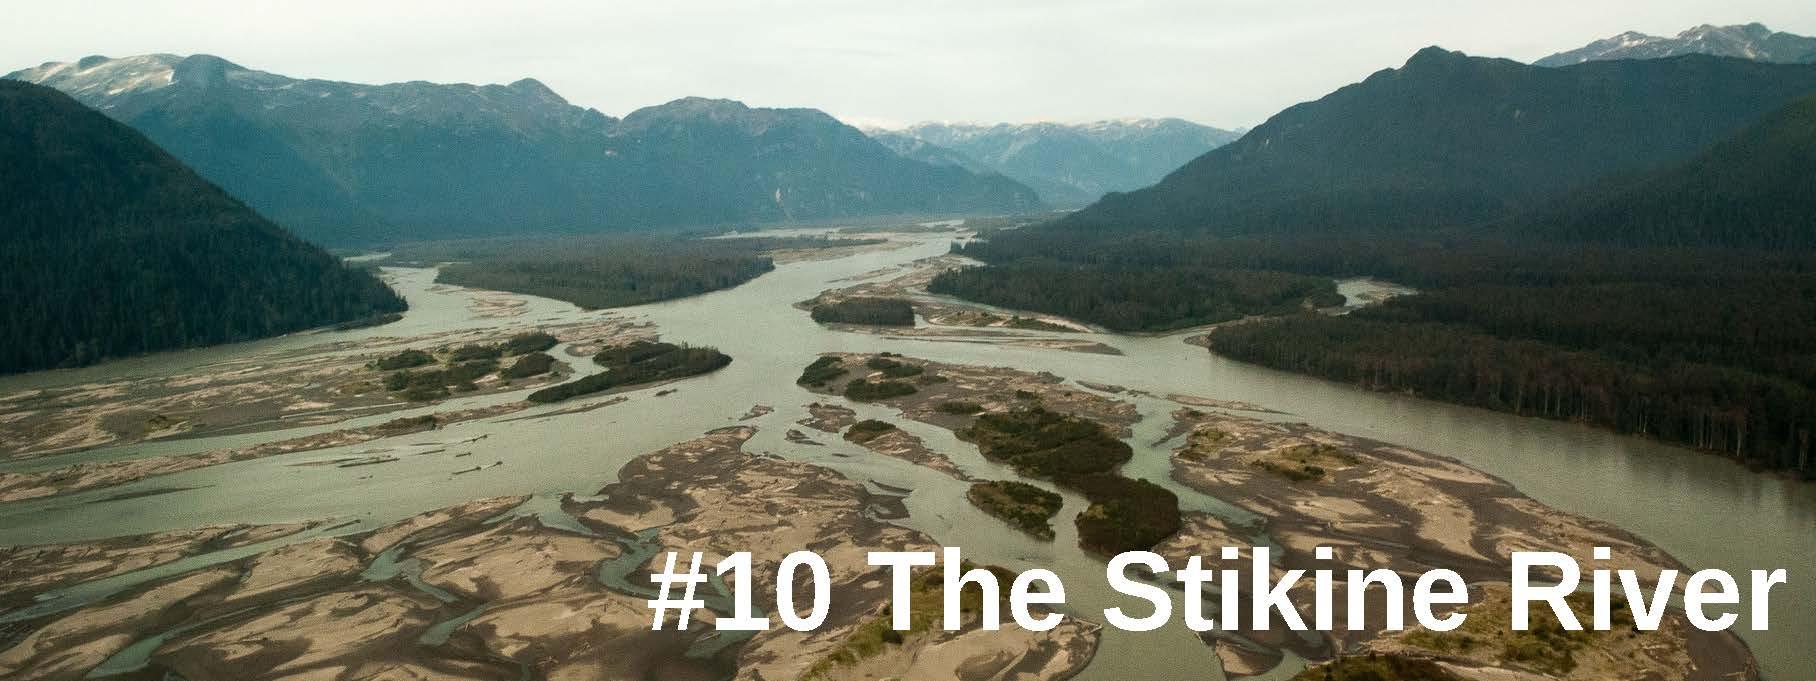 Stikine_River.jpg